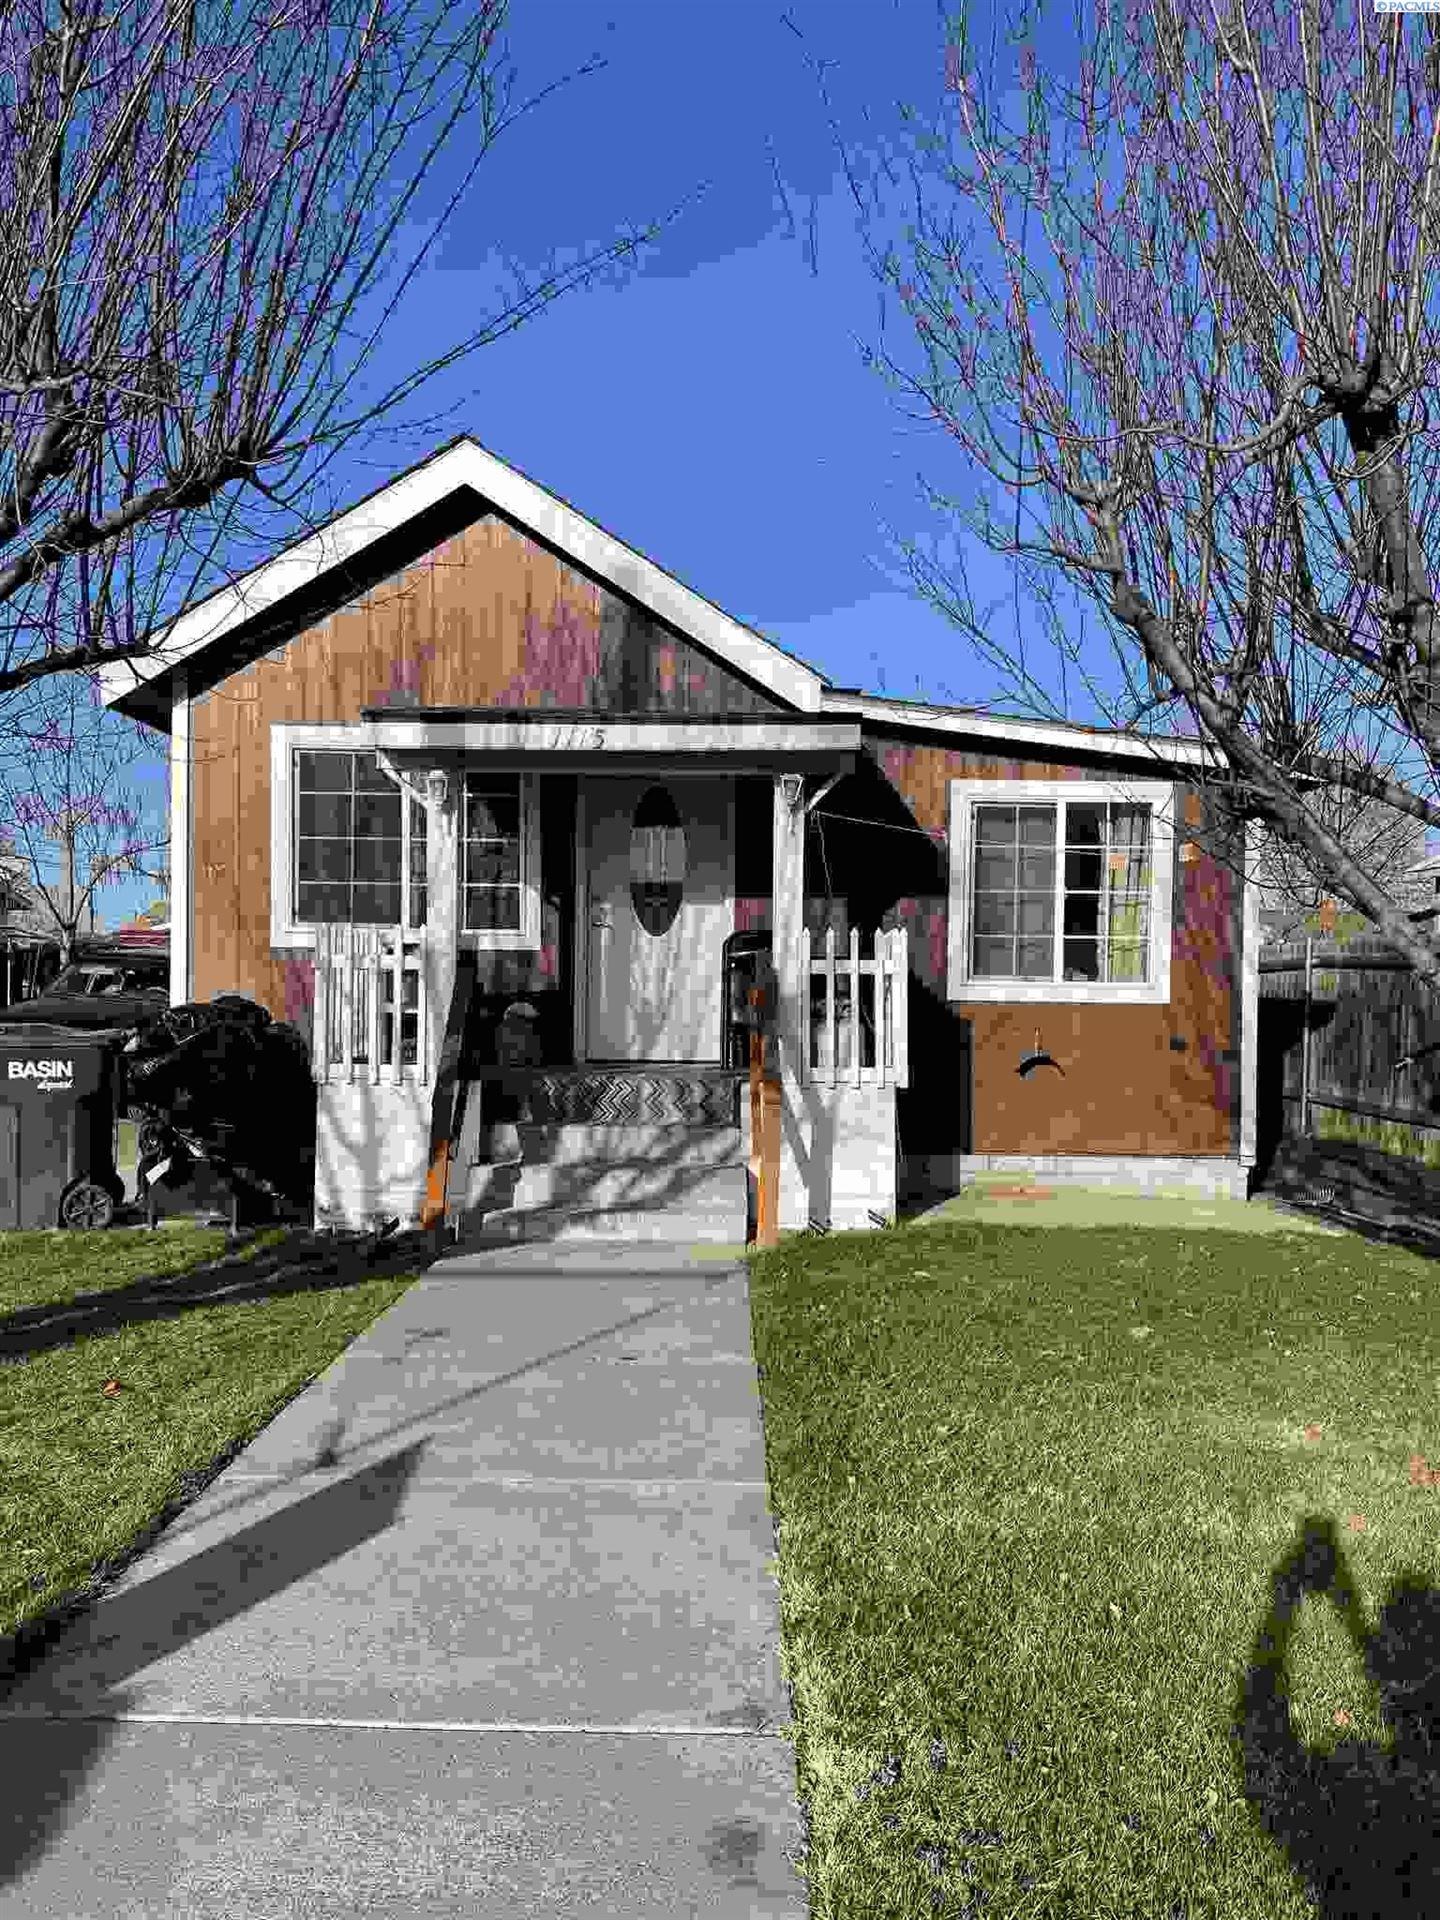 Photo of 1115 W Yakima St., Pasco, WA 99301 (MLS # 250869)